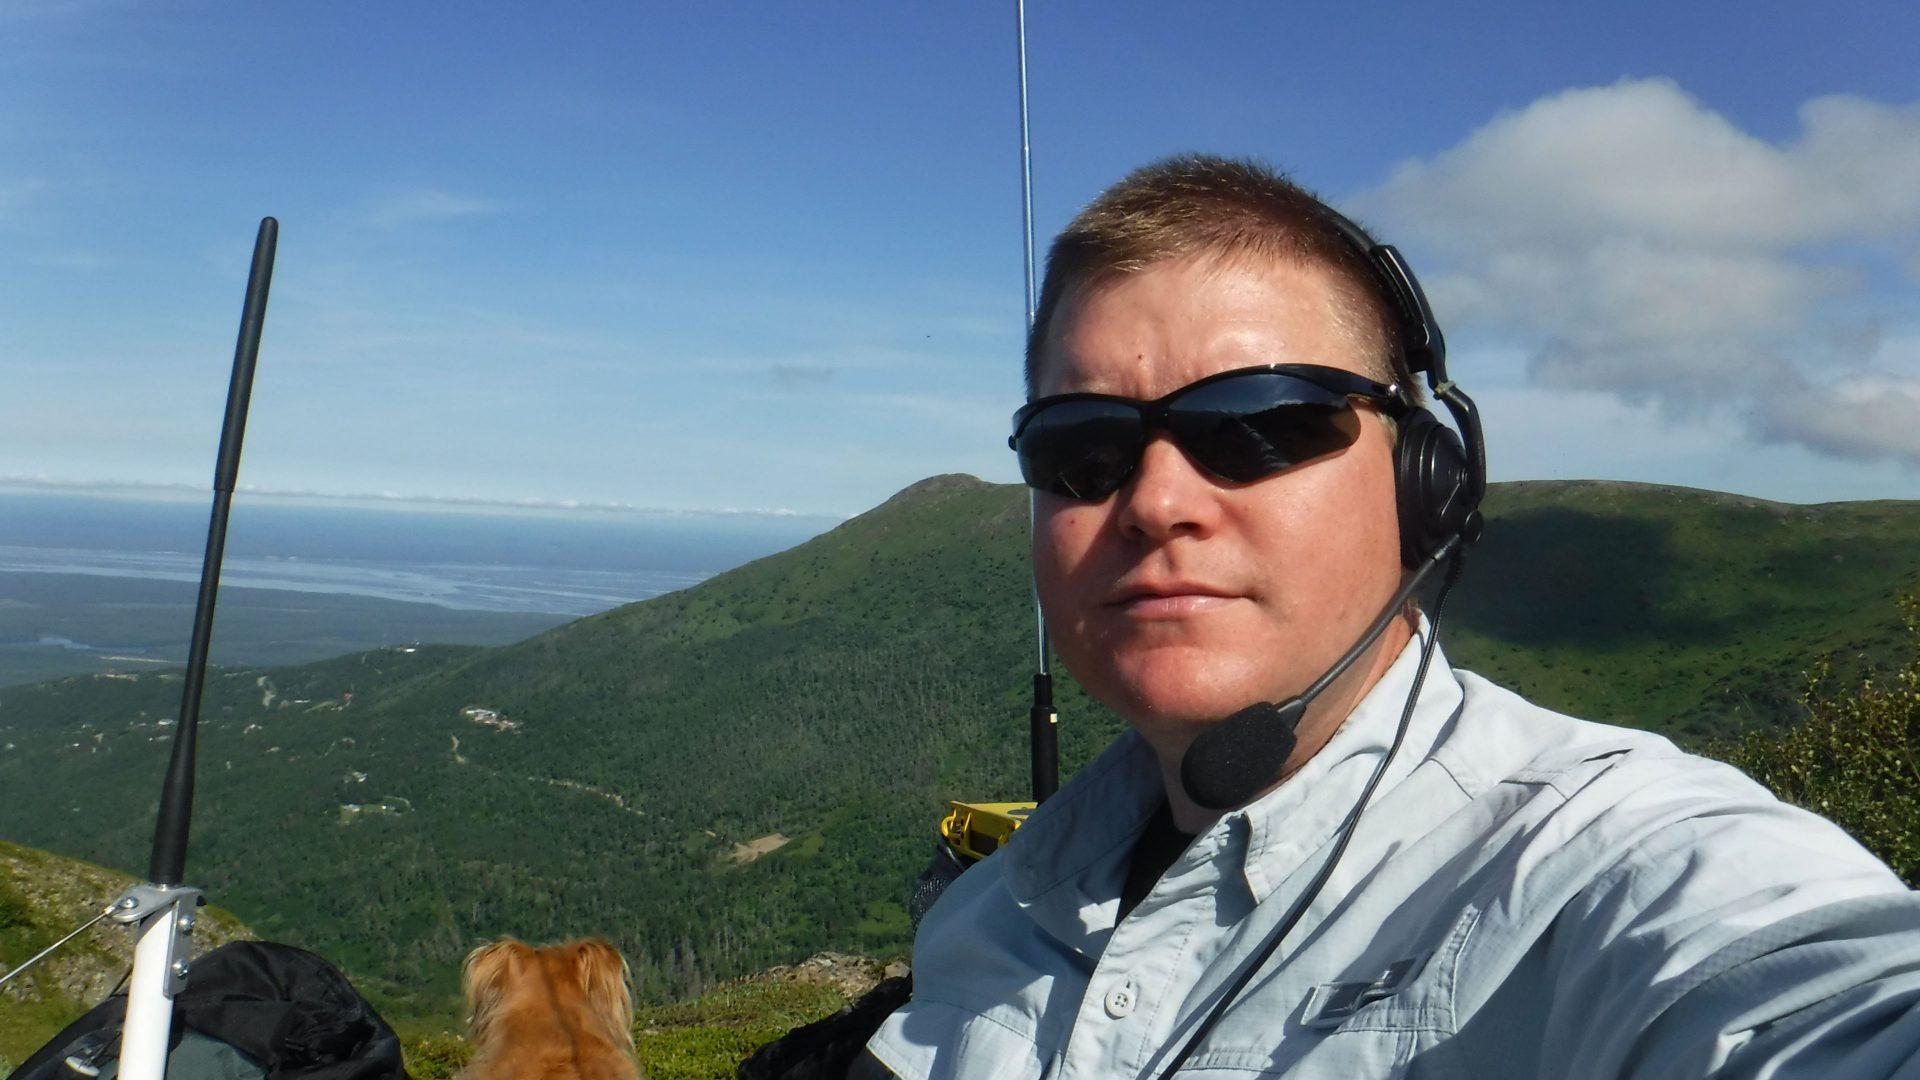 Amateur radi ooperator for the CQ WW VHF